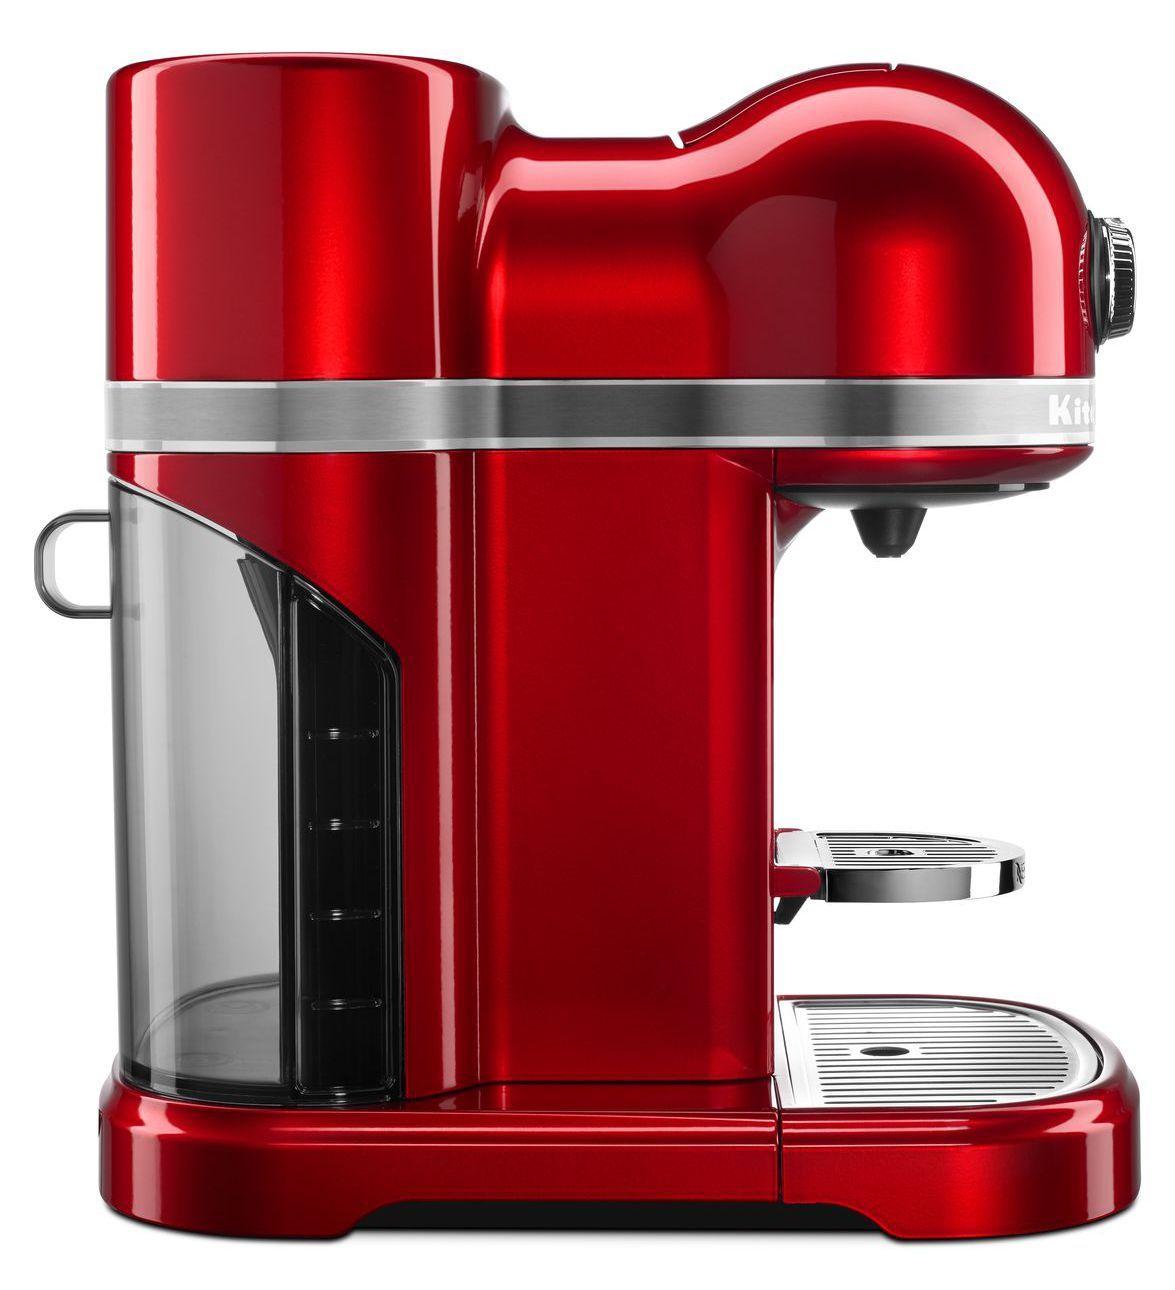 ???PAGE_TITLE_TEXT??? Kitchen aid, Espresso maker, Maker